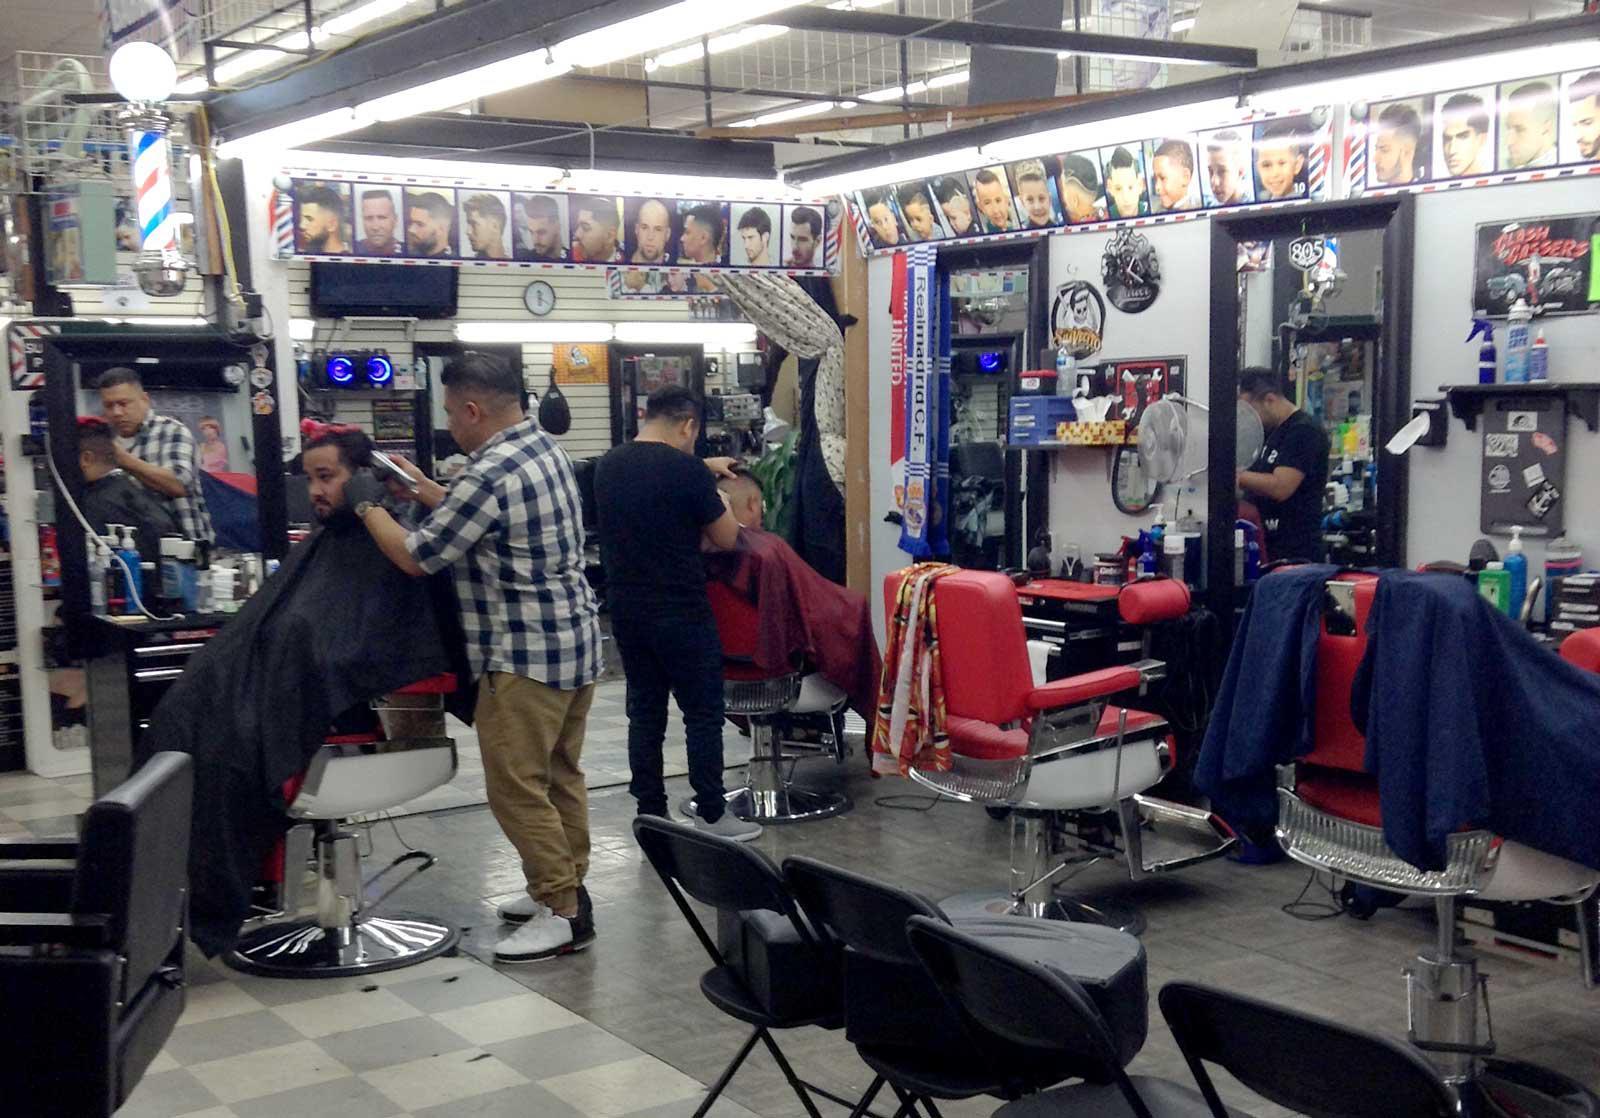 Three Brothers Beauty Salon & Barber shop